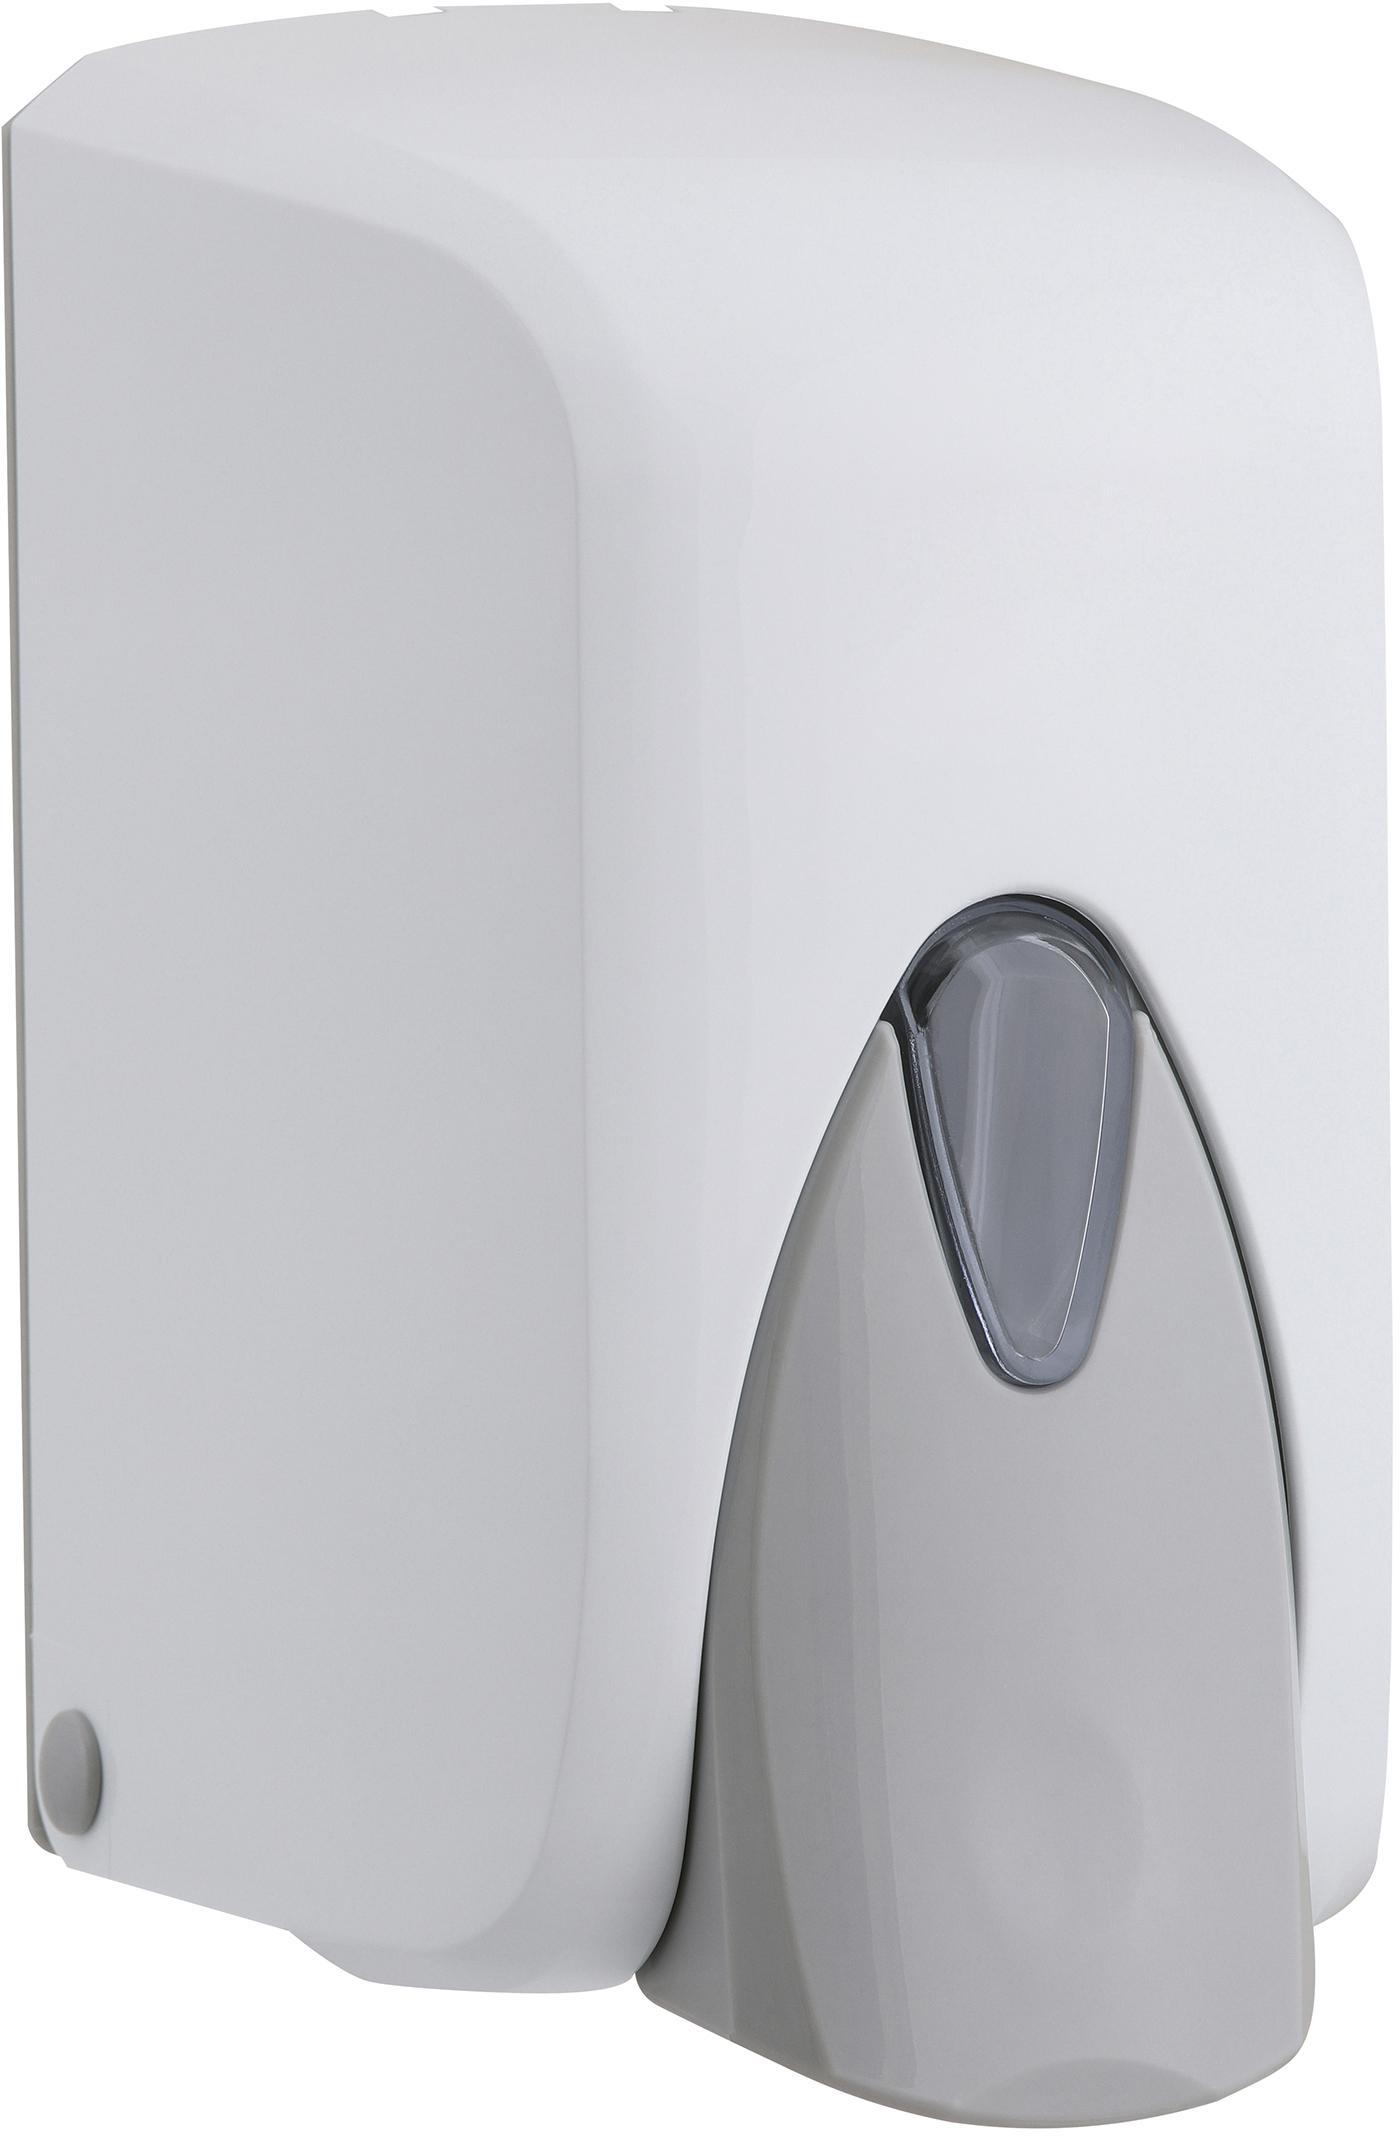 Дозатор для жидкого мыла Nowa S5 nowa диспенсер nowa k7 nowa